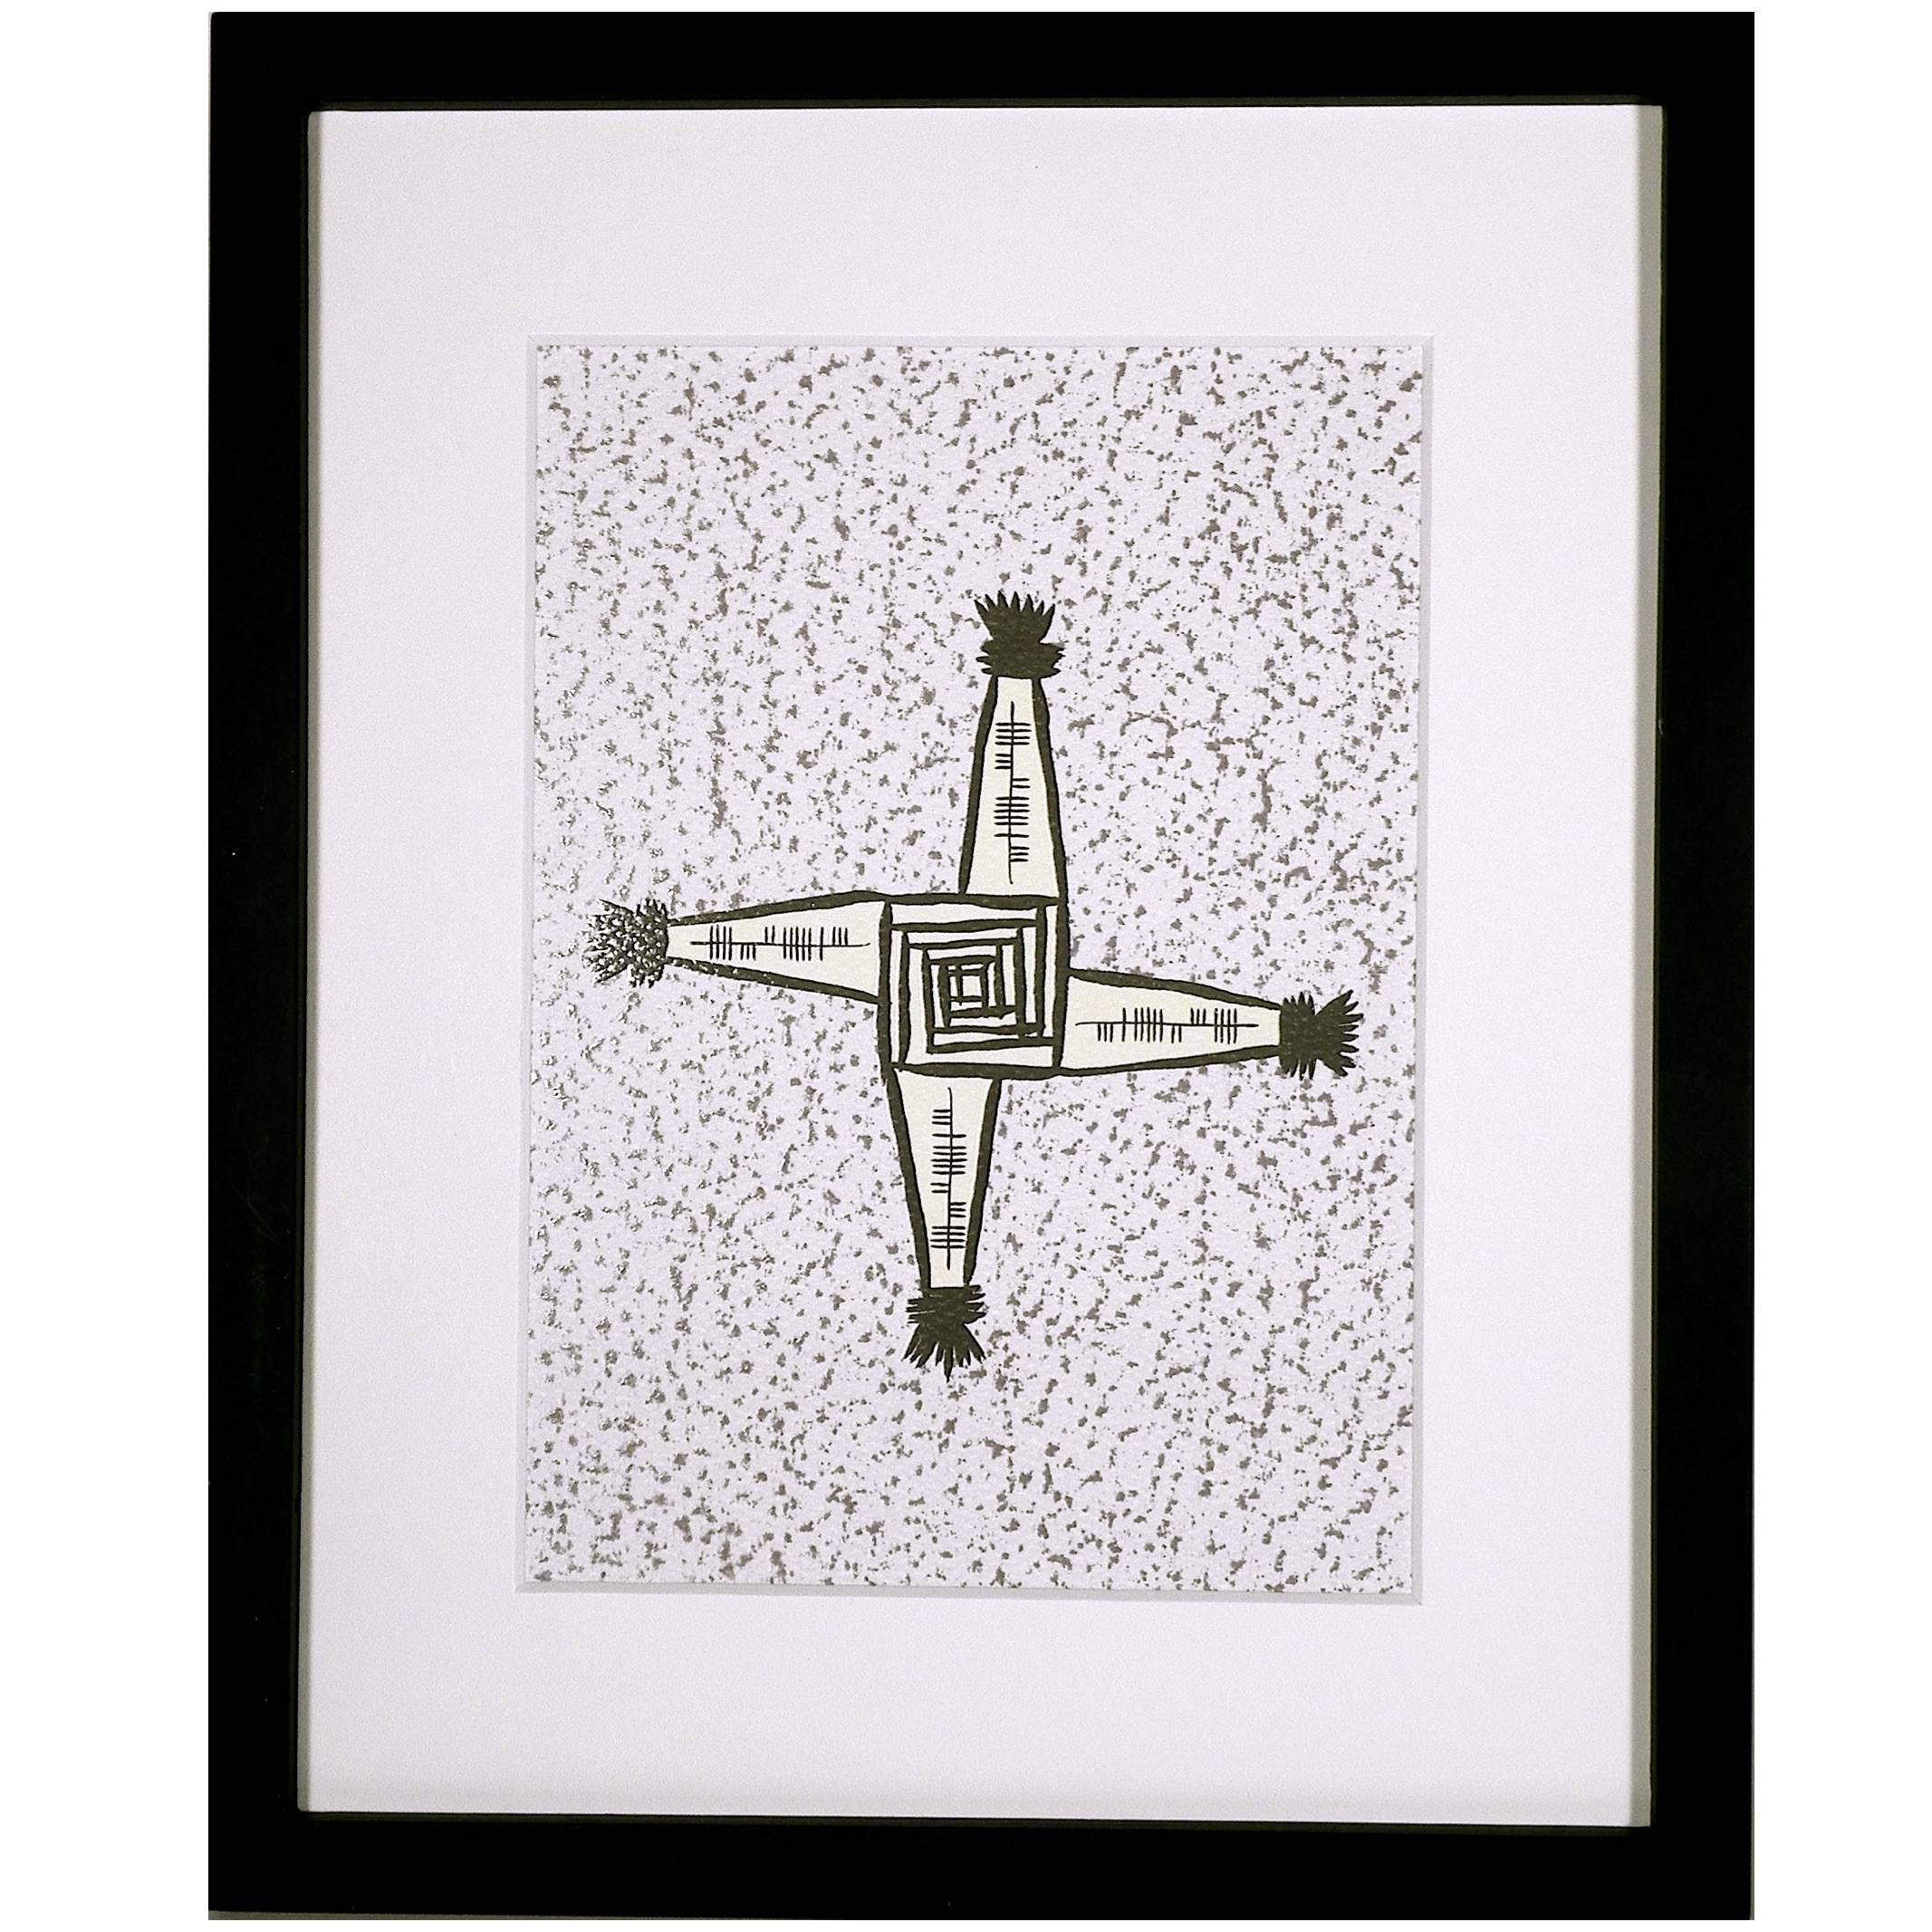 imbolc brigid's cross welcome fáilte framed irish celtic art